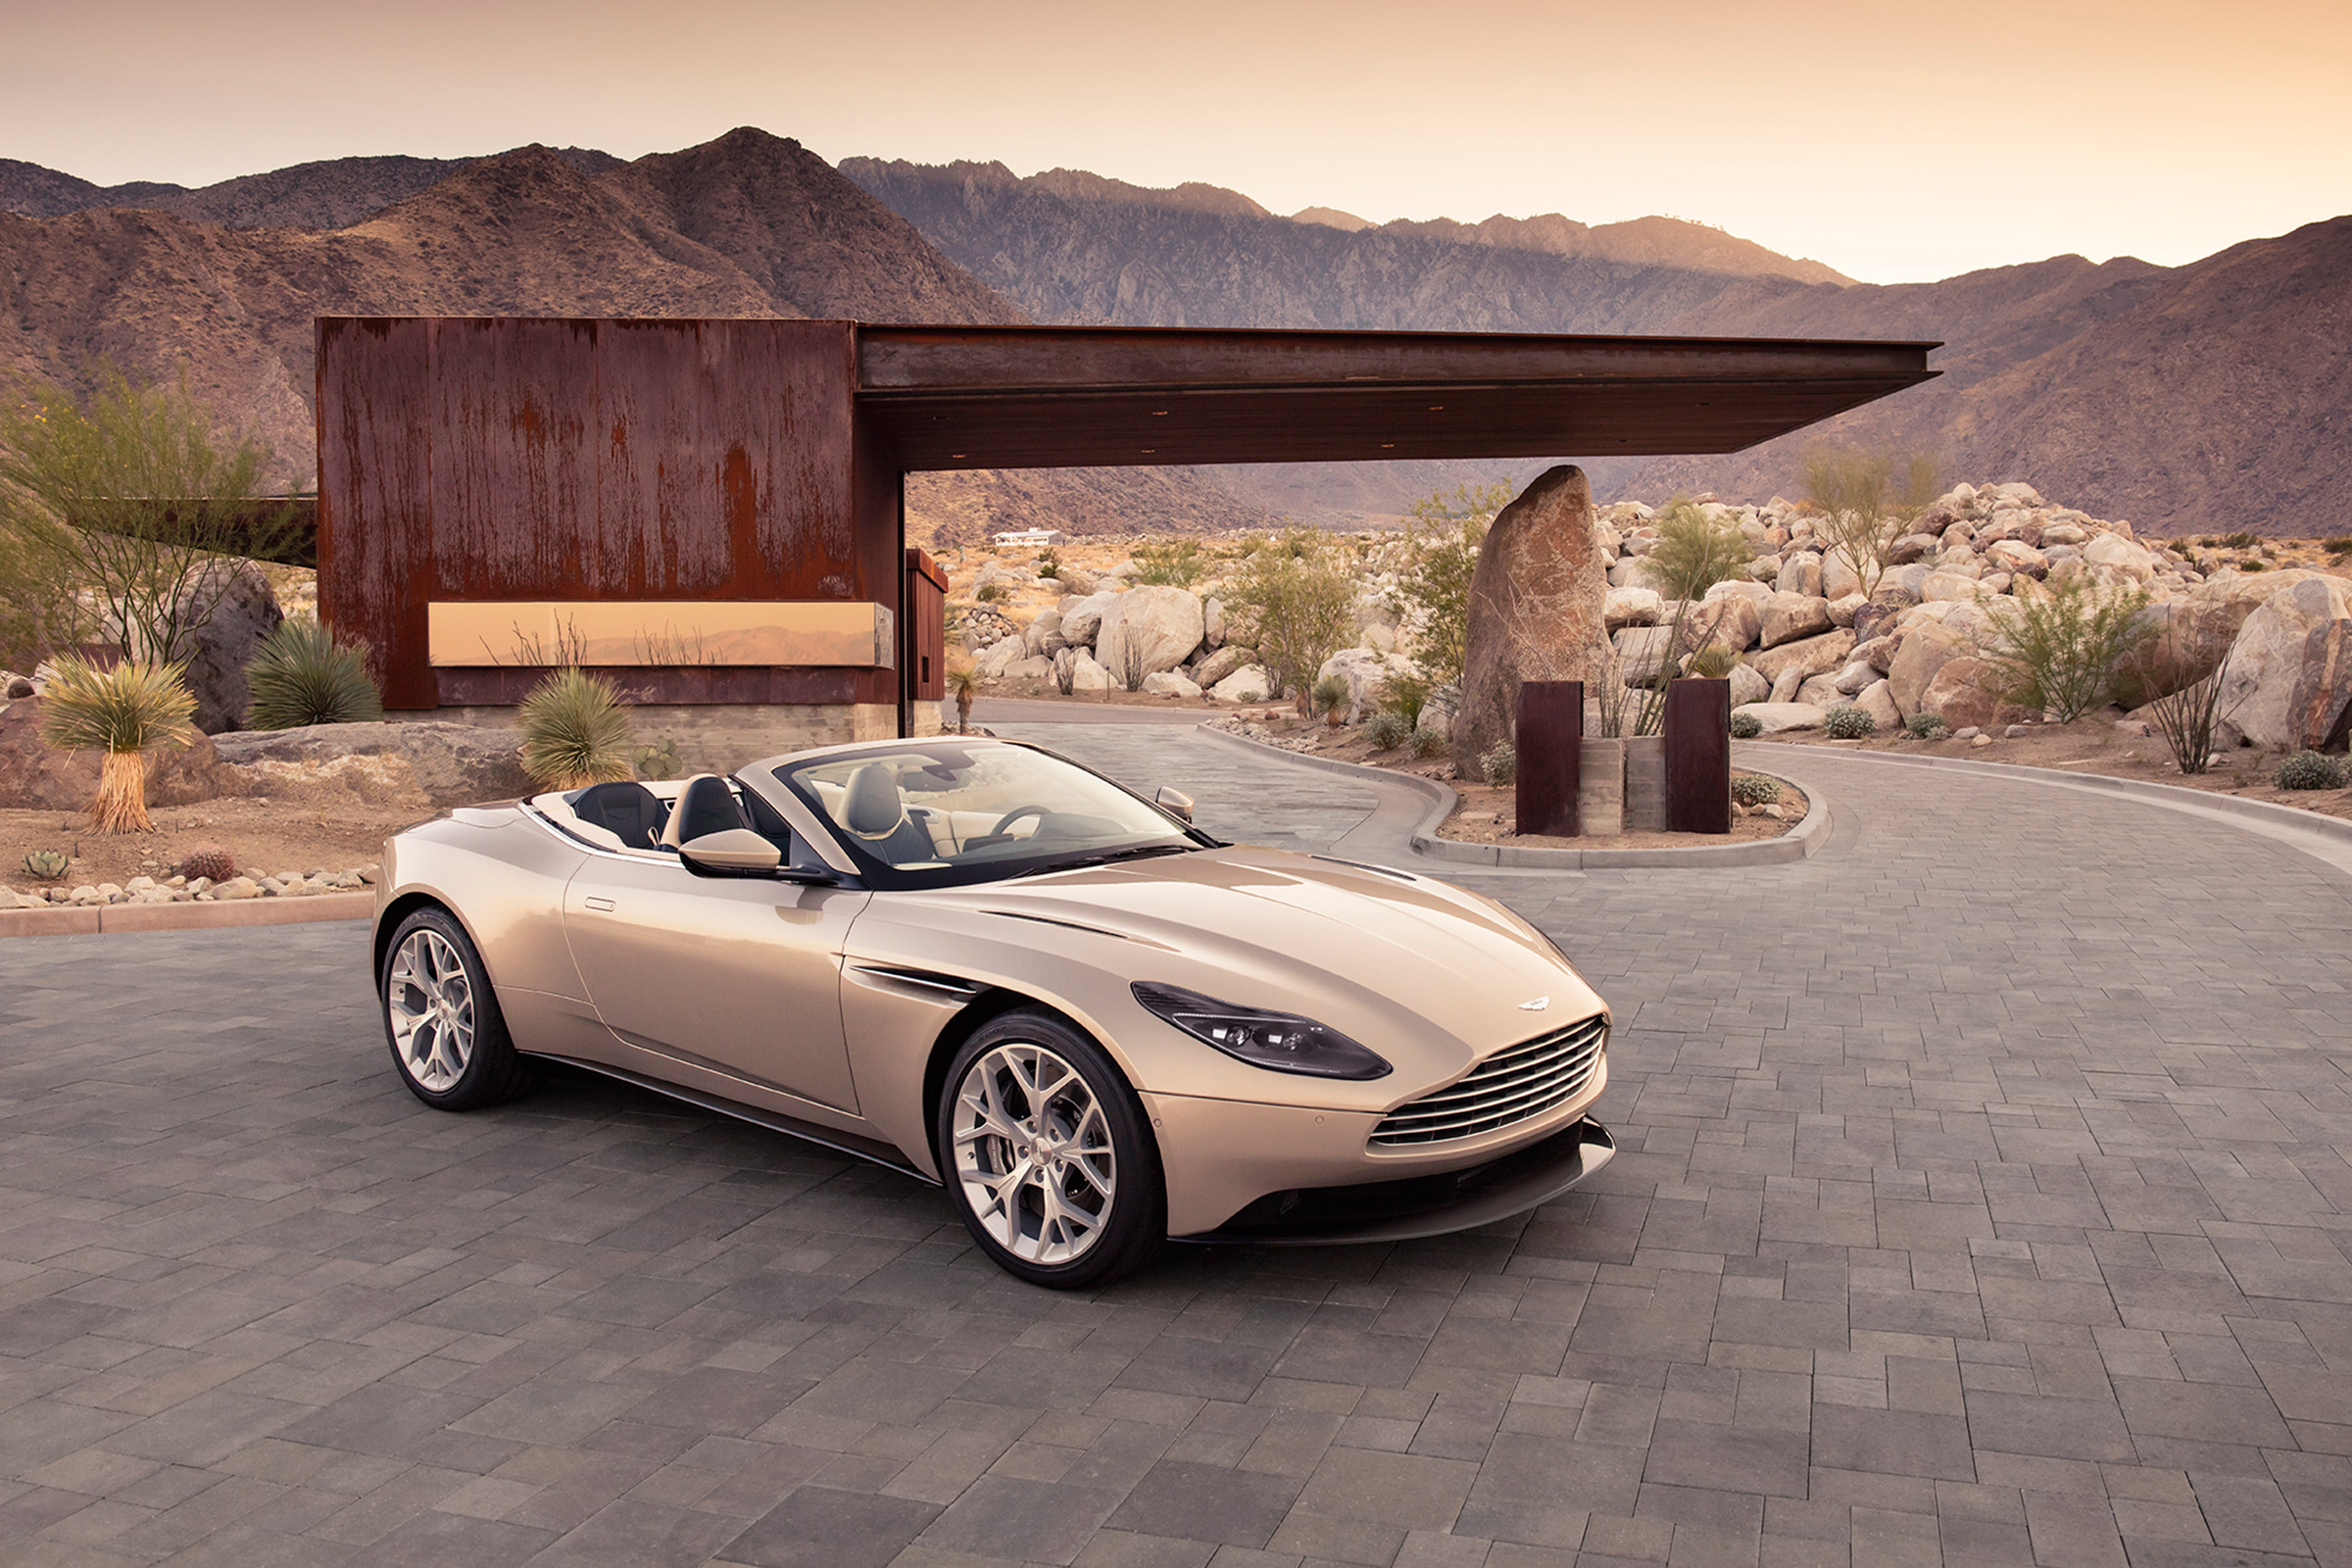 Aston Martin Stock >> Aston Martin Owners Considering Possible Stock Market